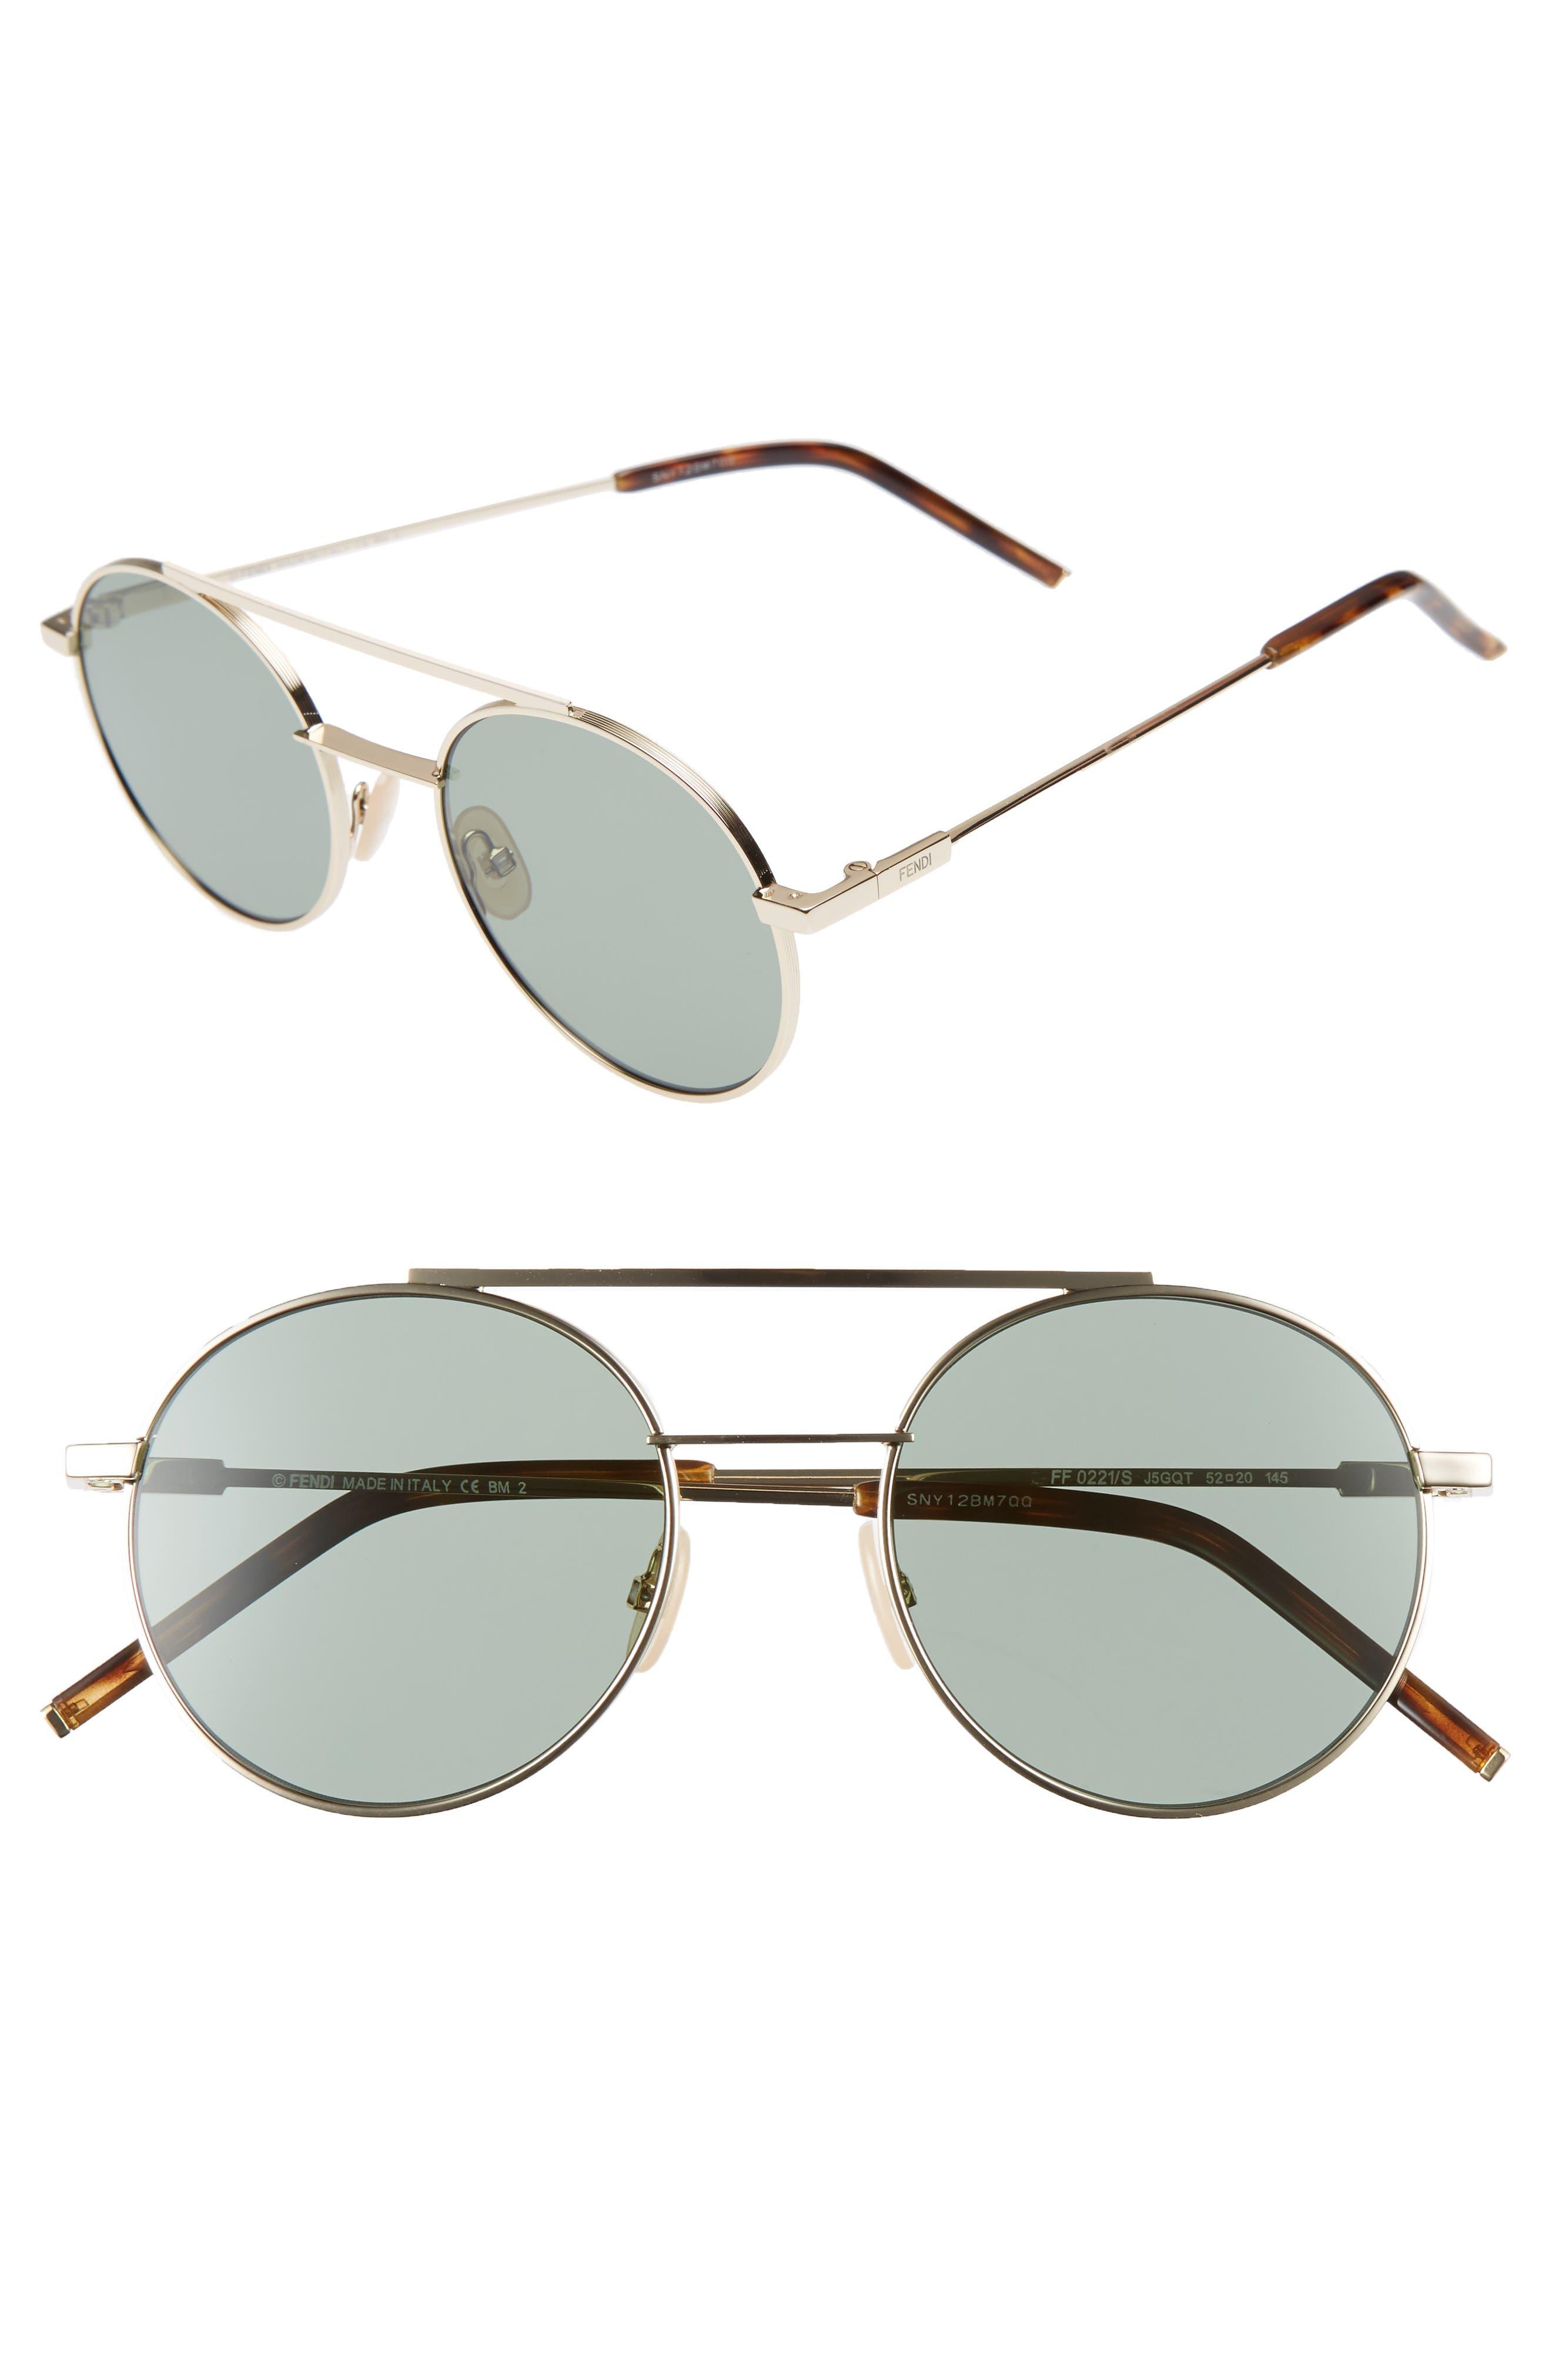 Fendi 52mm Round Sunglasses